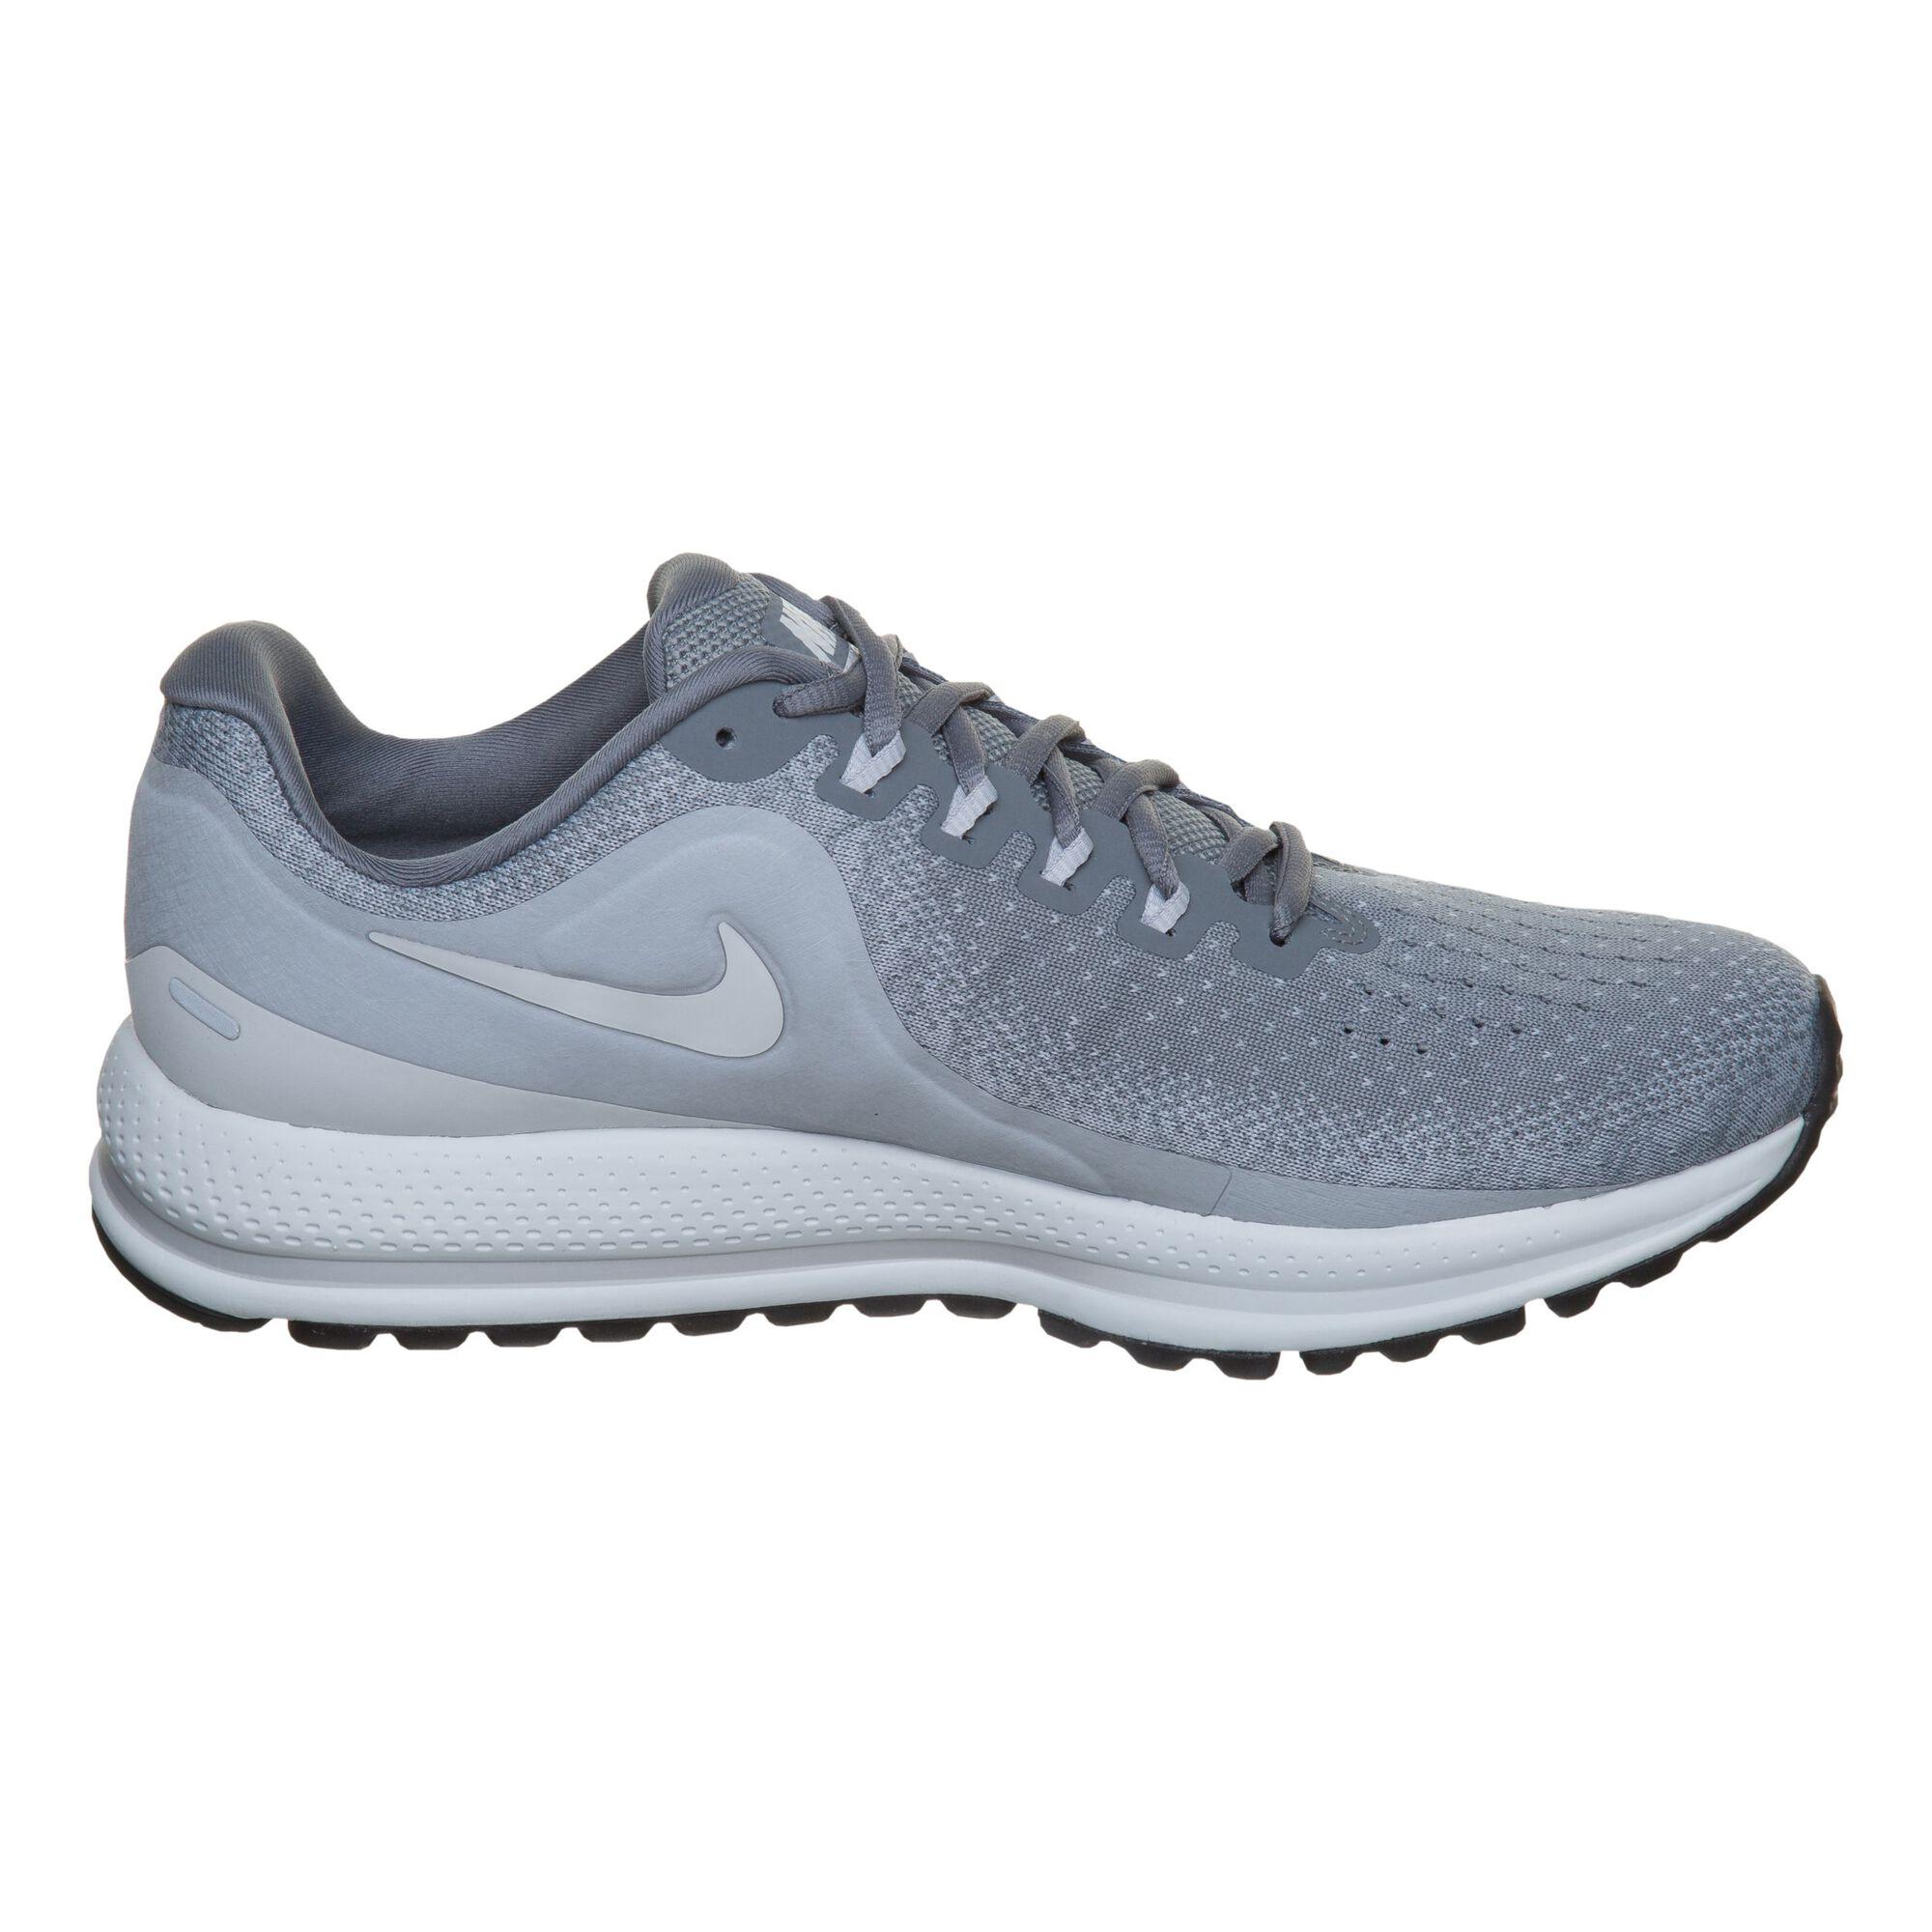 2b51fce6d58a Nike · Nike · Nike · Nike · Nike · Nike · Nike · Nike · Nike · Nike. Air  Zoom Vomero 13 ...